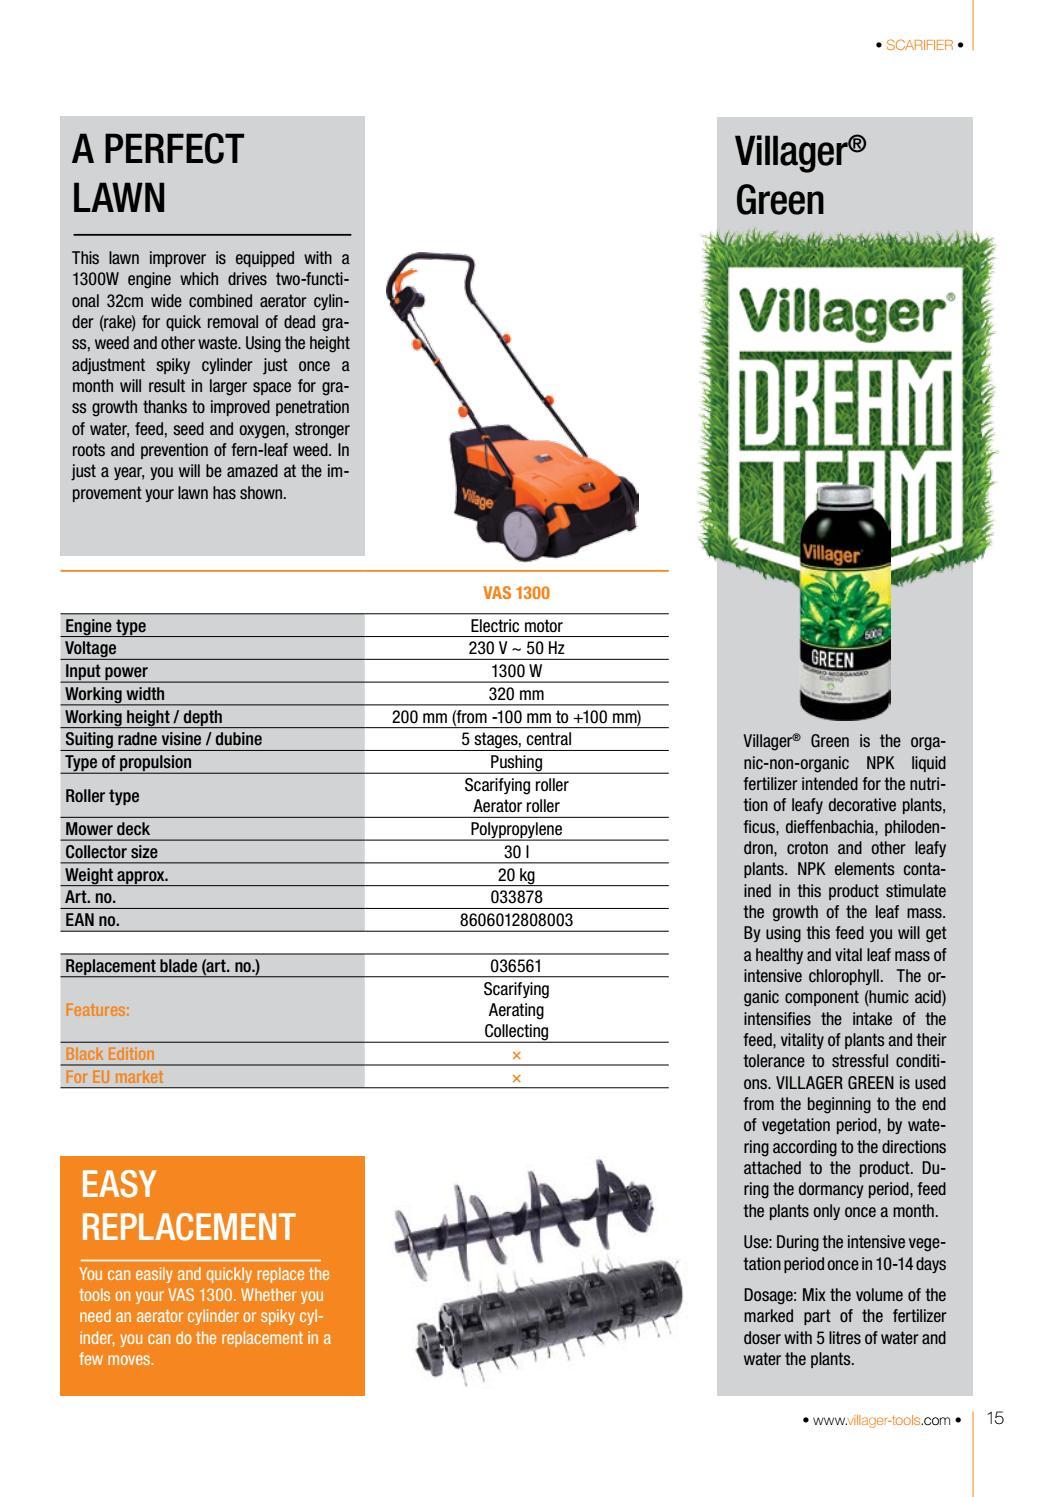 Katalog garden tools 2017 eng web by Agromarket - issuu